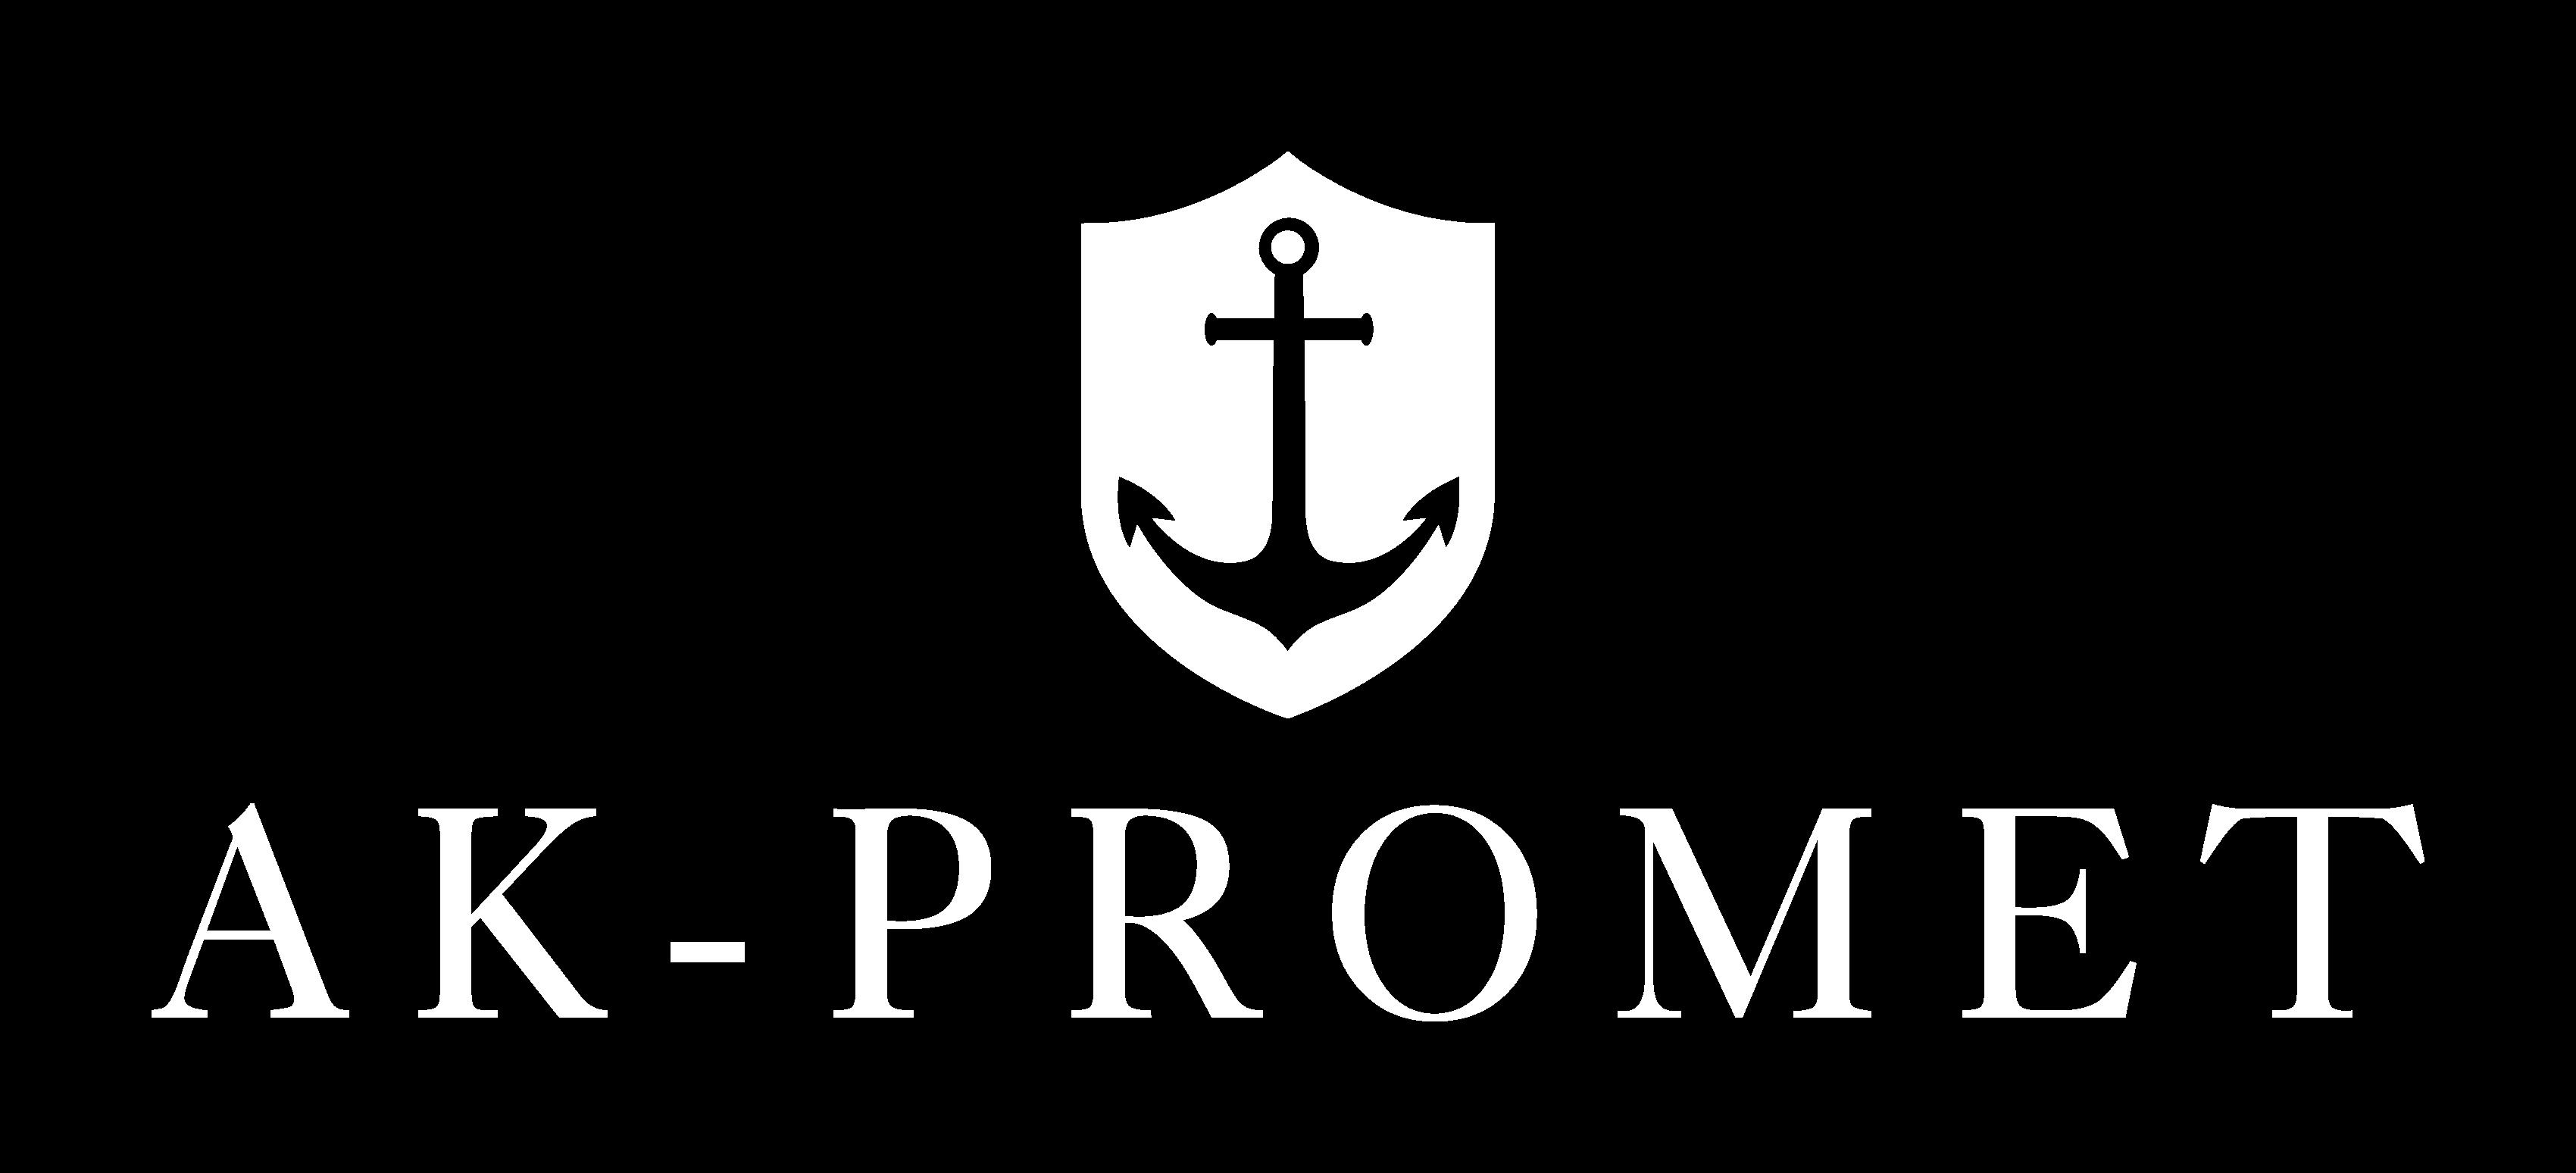 AK promet